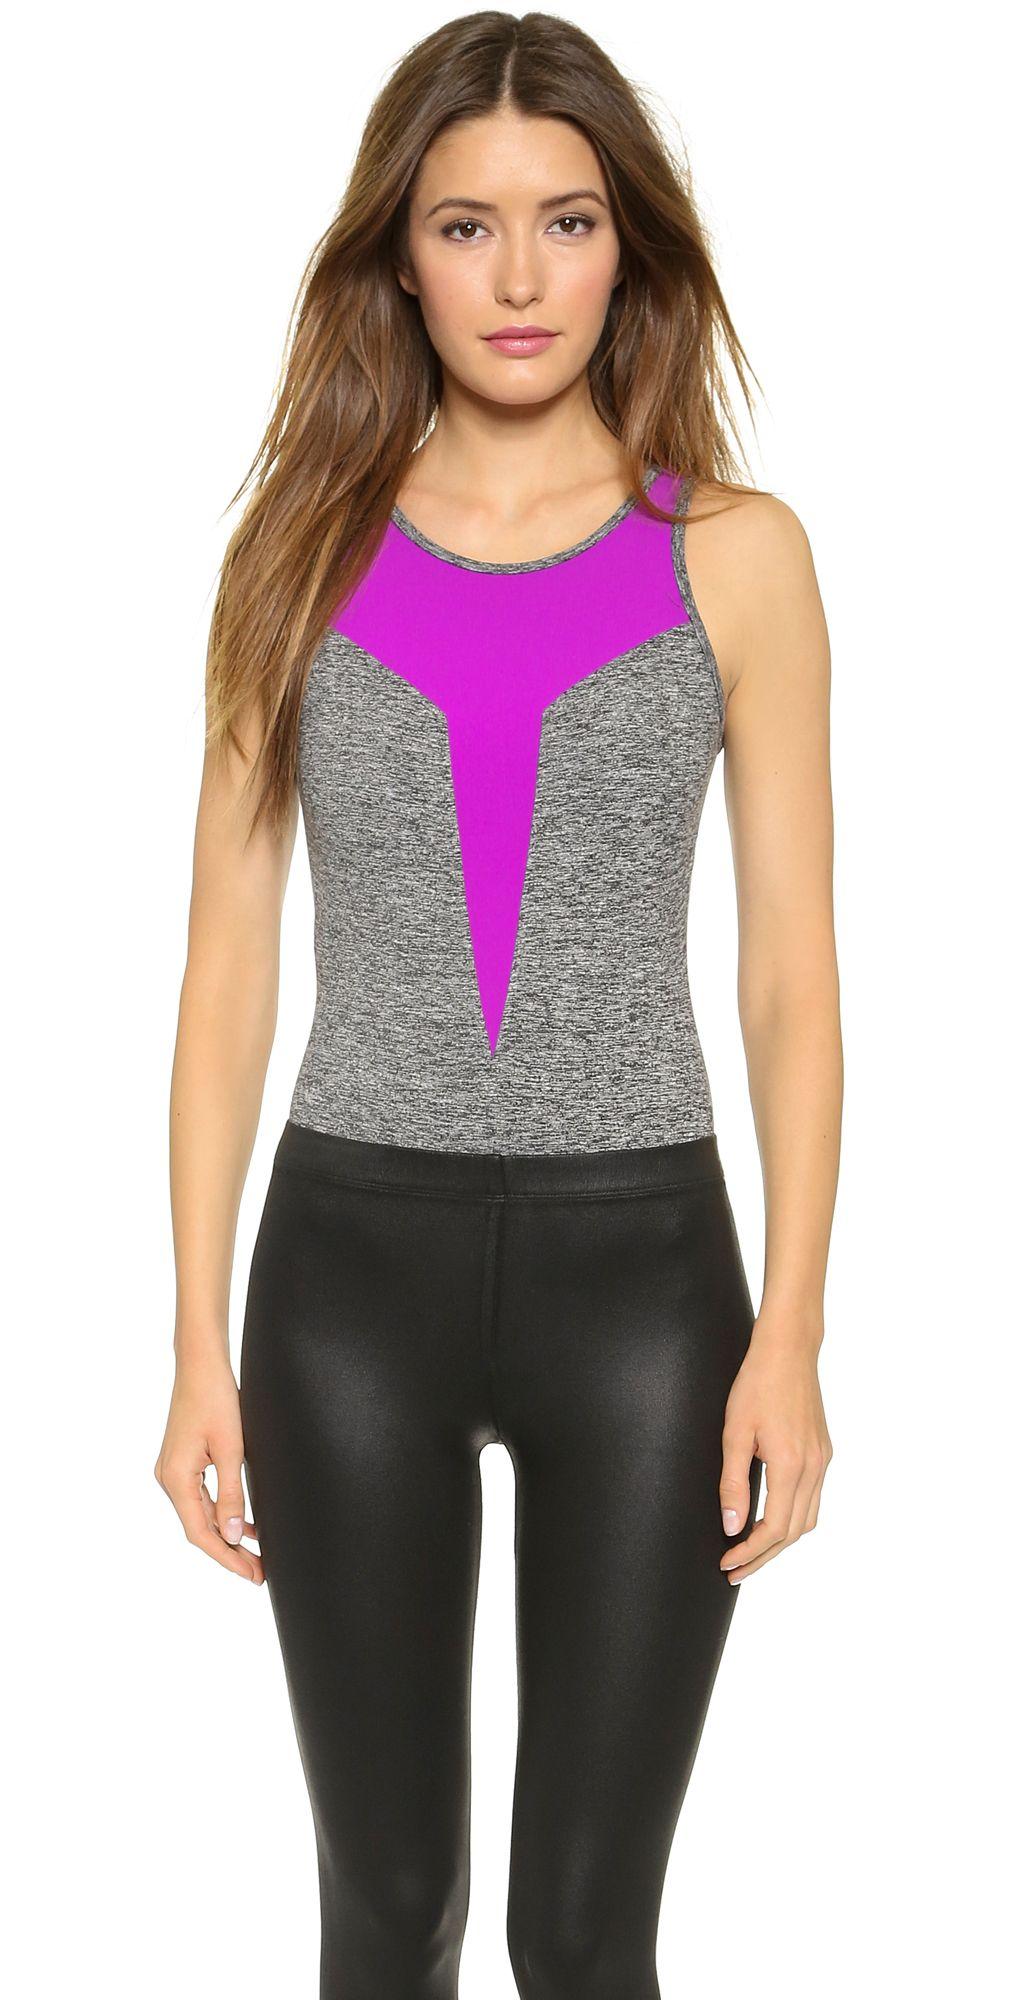 Shopbop Buy More Save More Sale: Save 25% Winter Fashion